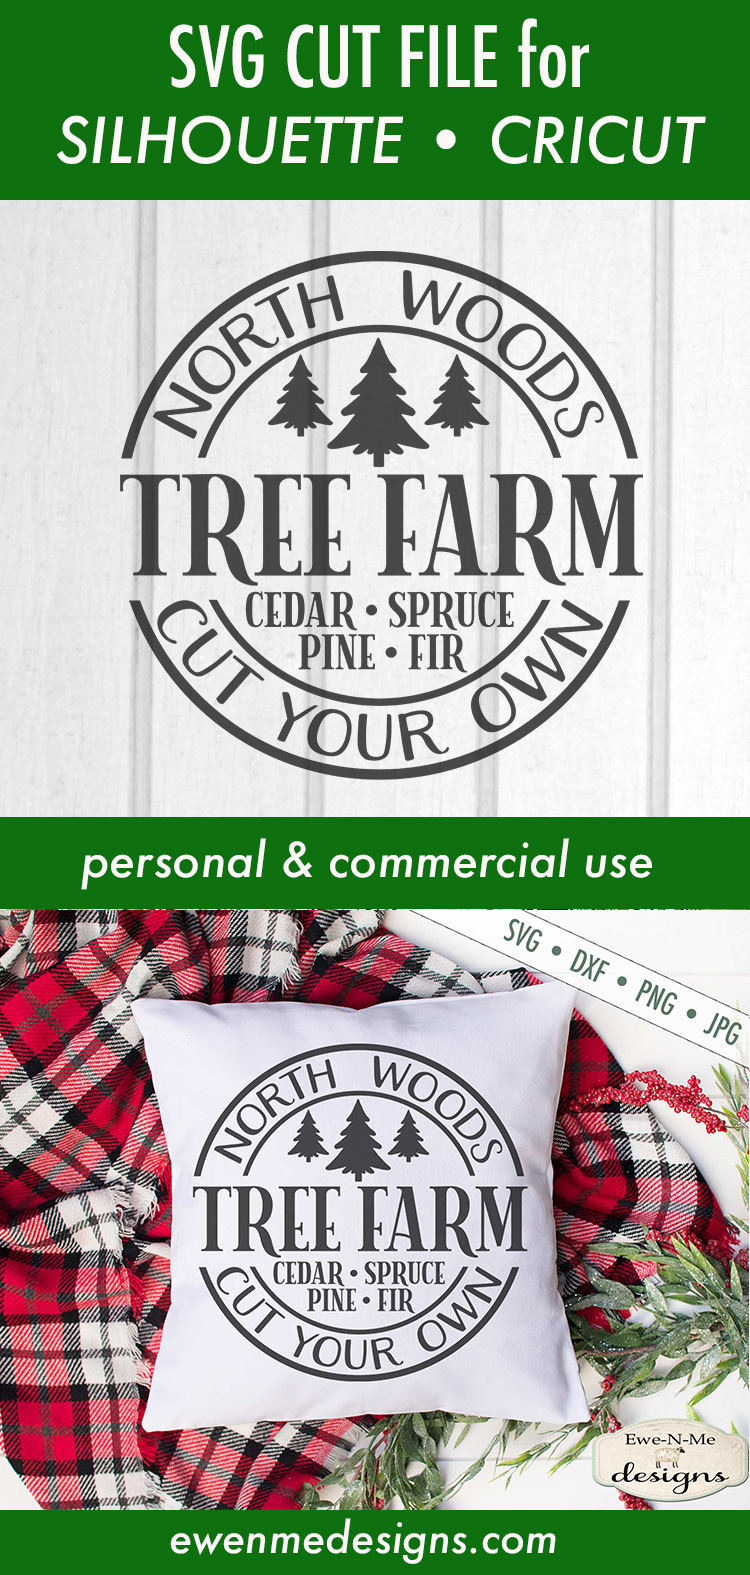 North Woods Tree Farm - Christmas Tree - SVG example image 3